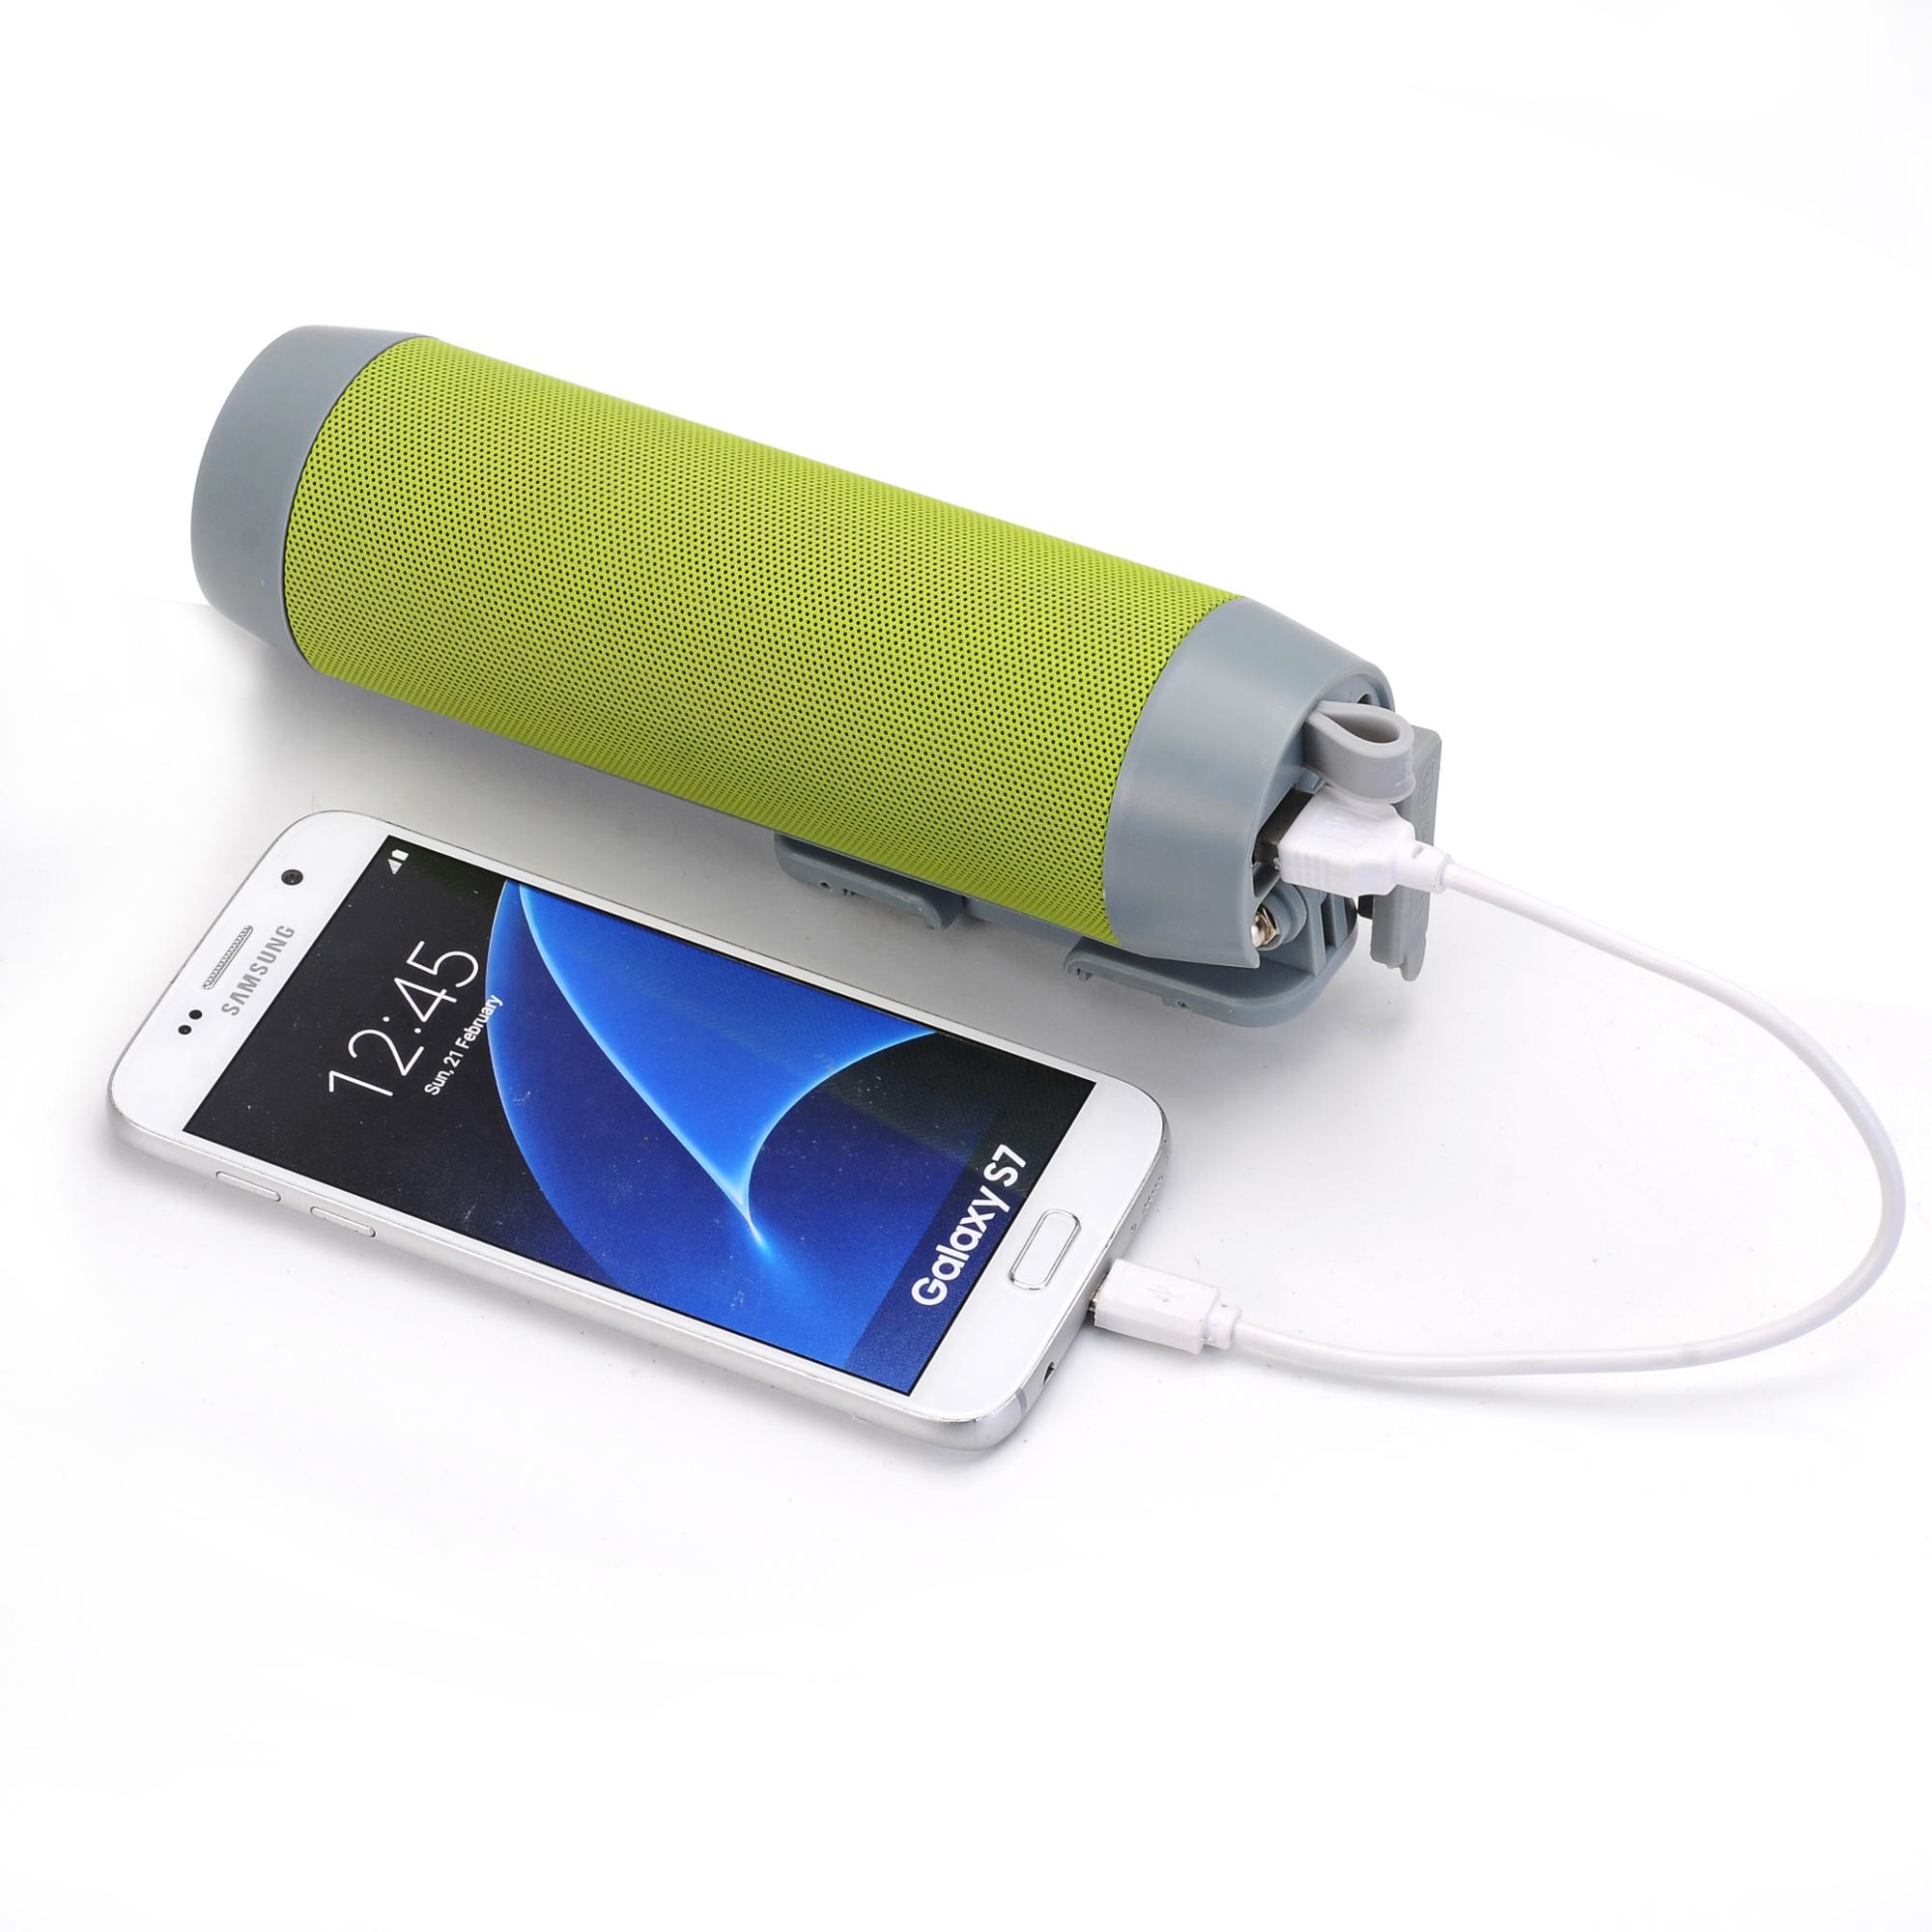 5 in 1 Selfie Speaker + 2000mah/ 4000mah Power Bank + Selfie Stick + Mobile Stand Multifunctional